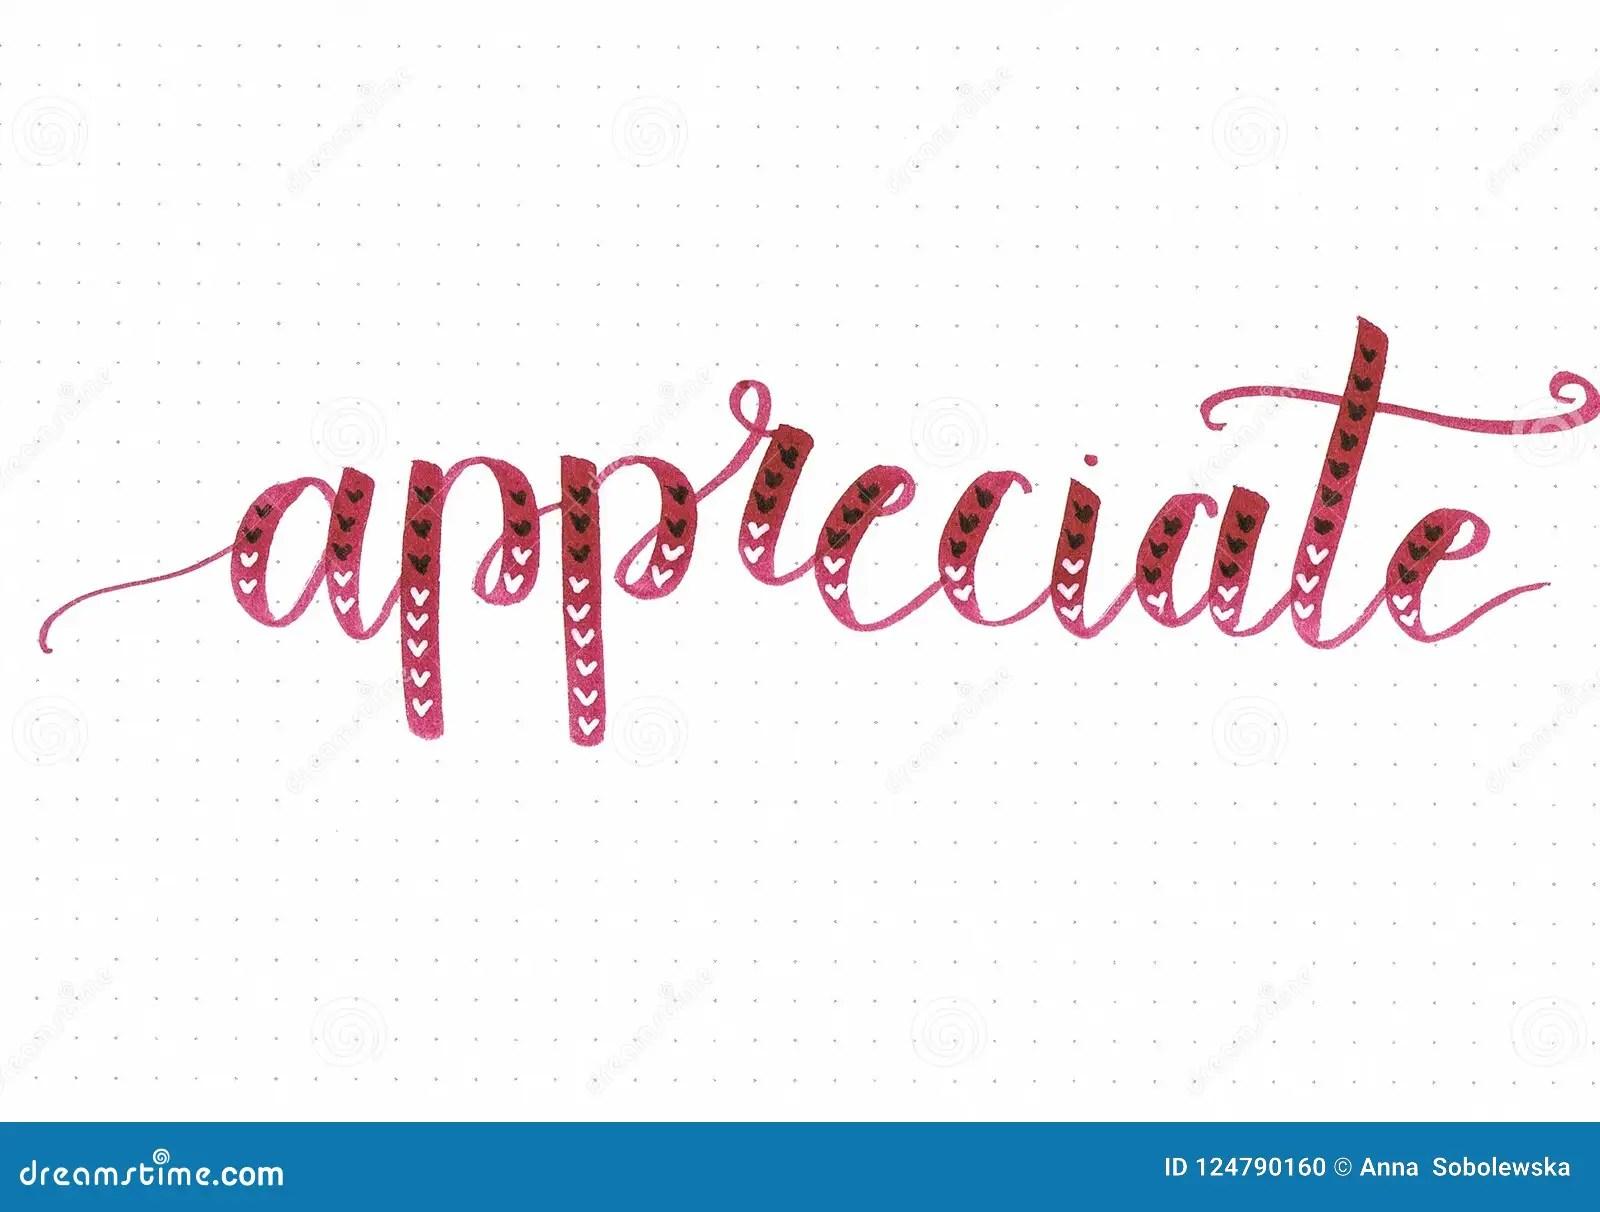 appreciate motivational hand lettering